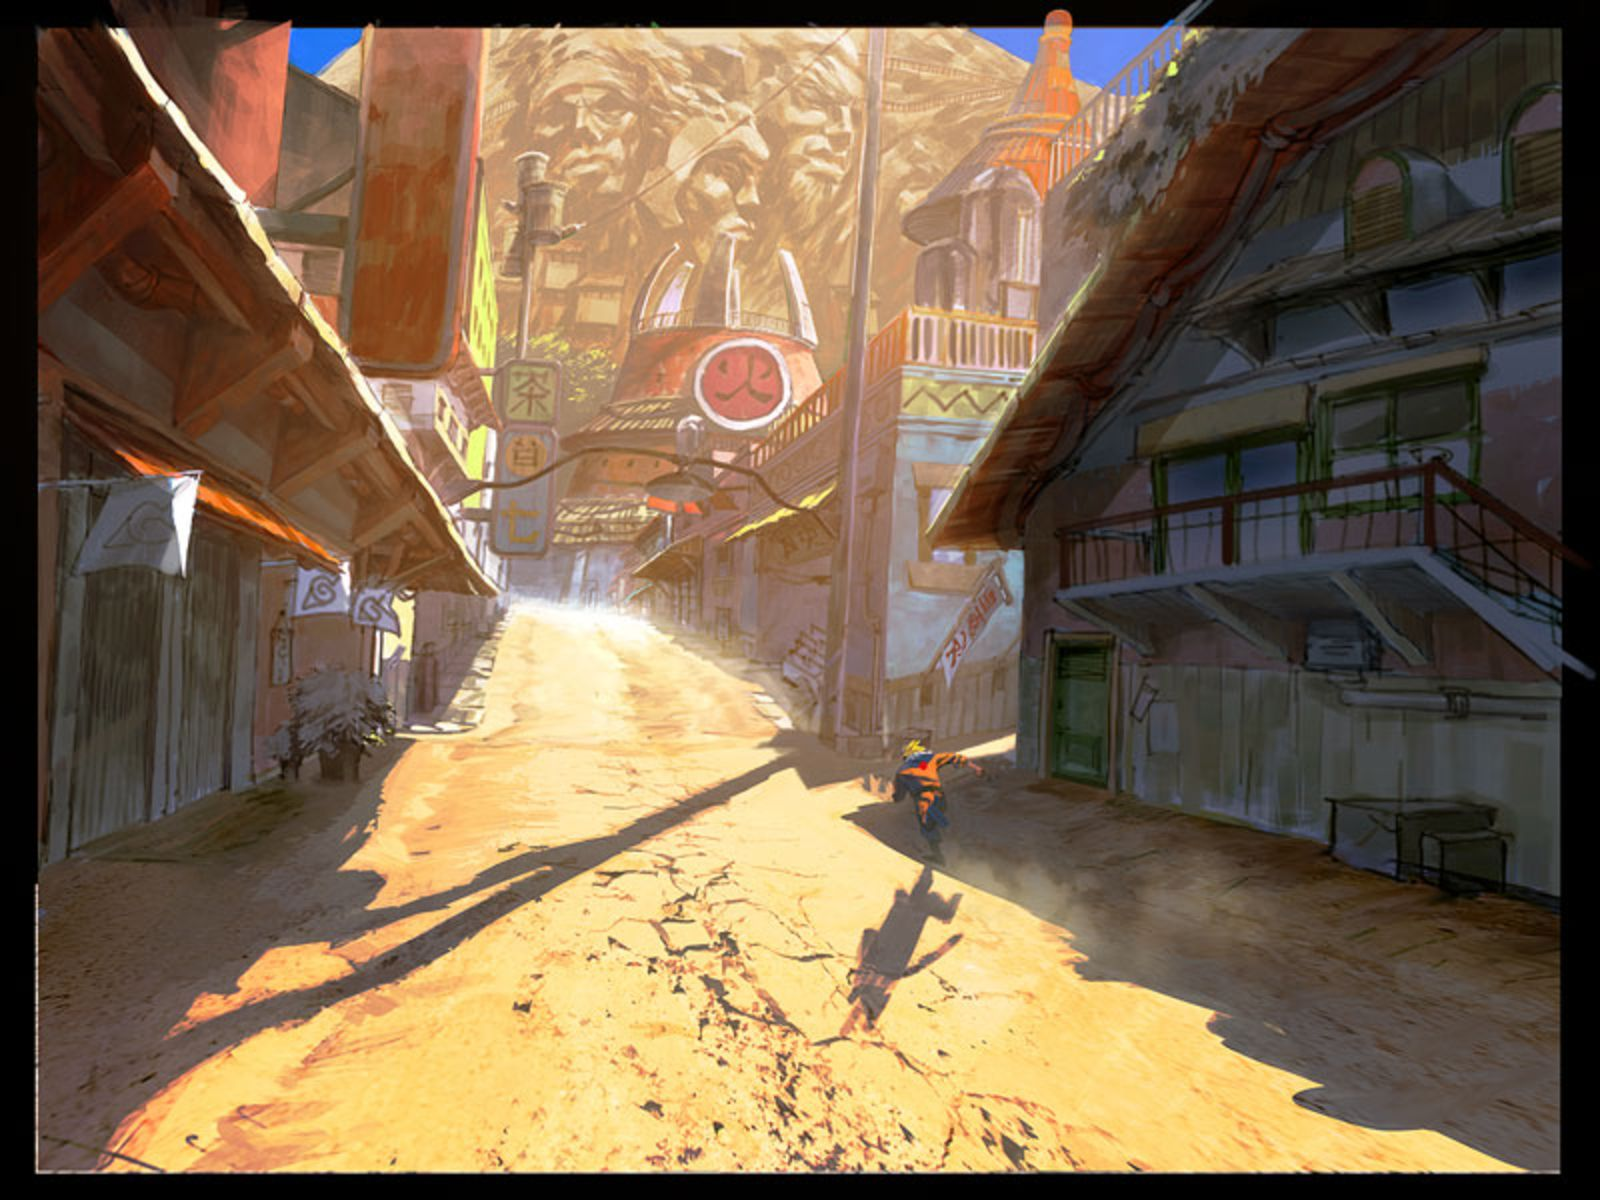 Naruto Village Wallpapers - Top Free Naruto Village